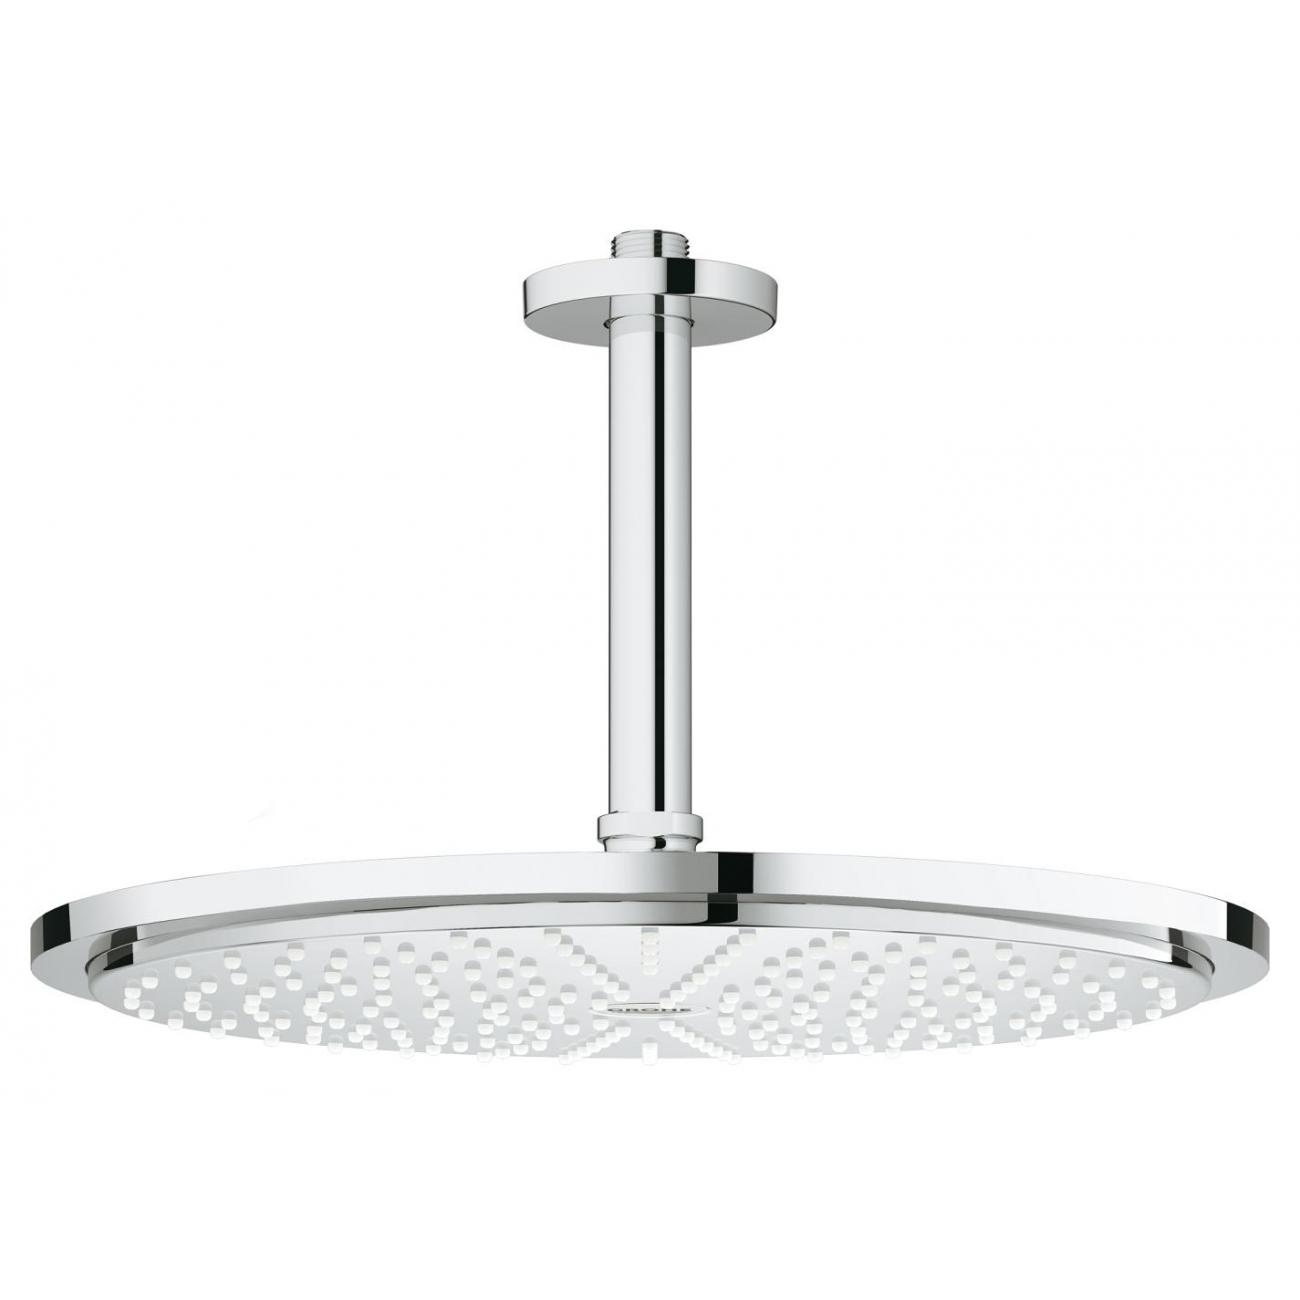 grohe cosmopolitan head shower set ceiling rainshower 310 tattahome. Black Bedroom Furniture Sets. Home Design Ideas